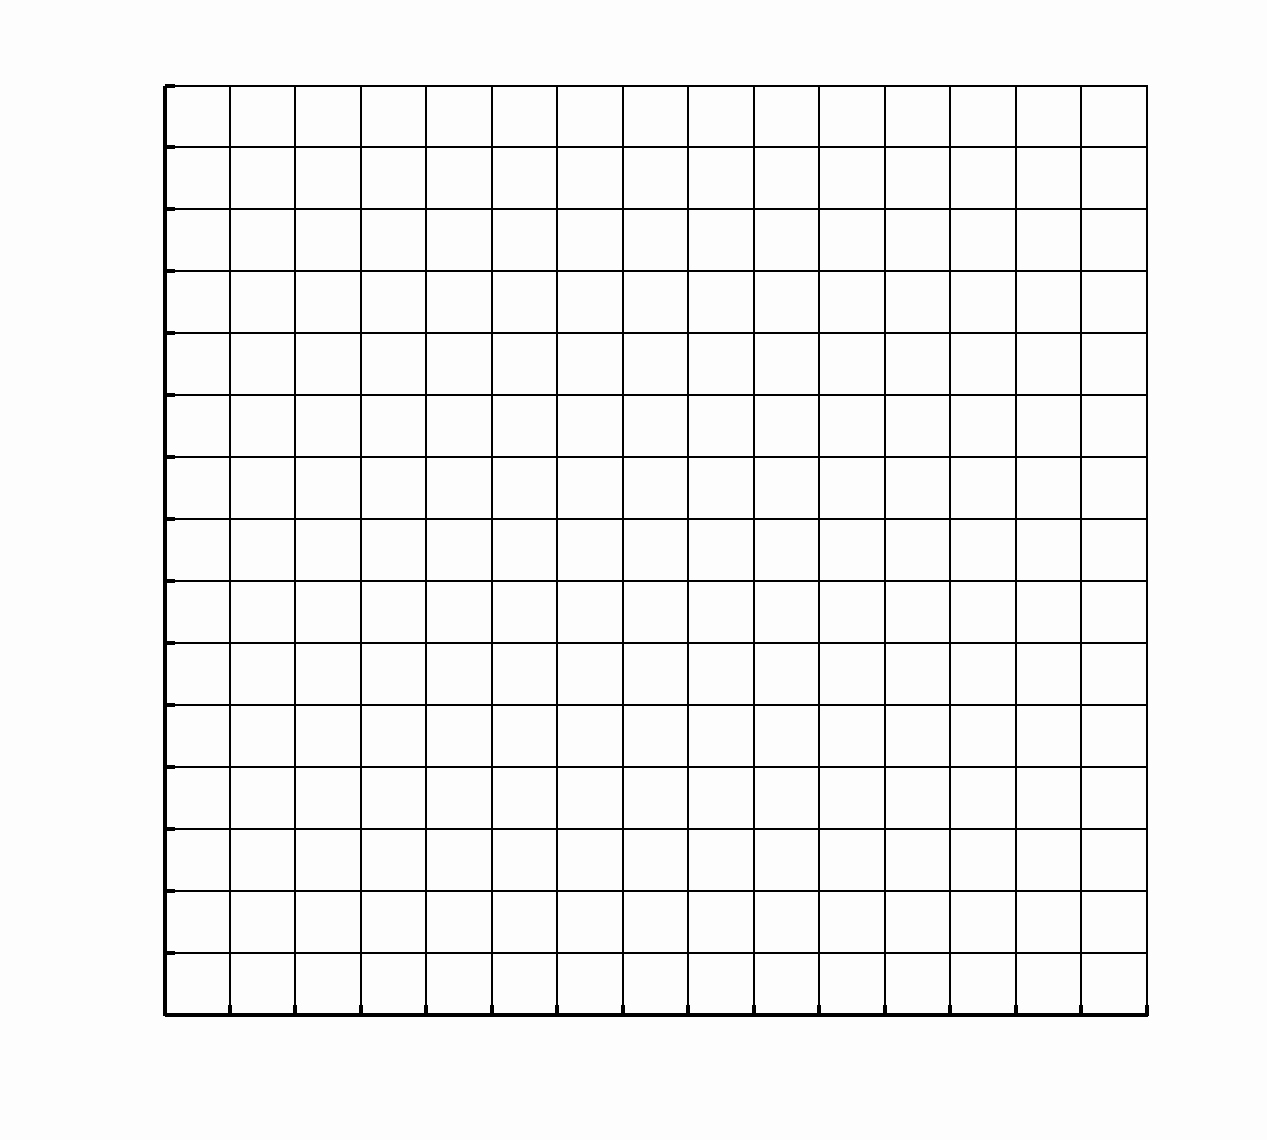 Blank Sudoku Grid Printable Elegant Worksheet Blank Grids Grass Fedjp Worksheet Study Site